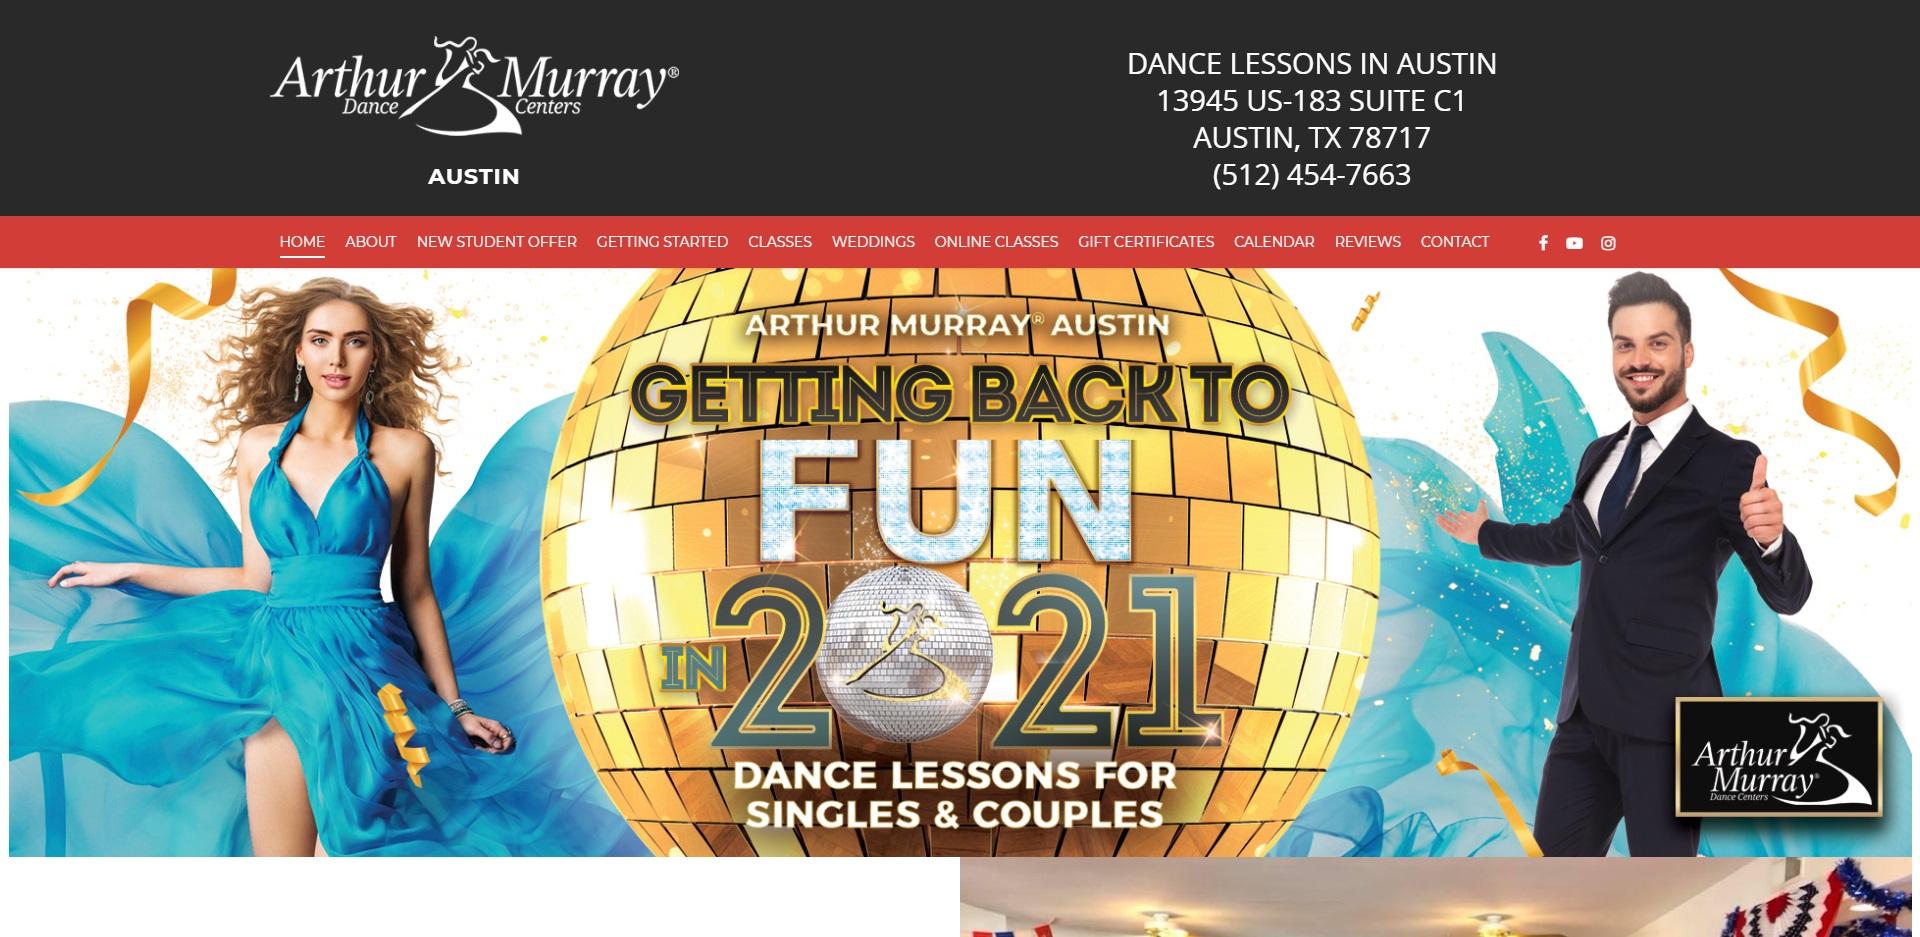 The Best Dance School in Austin